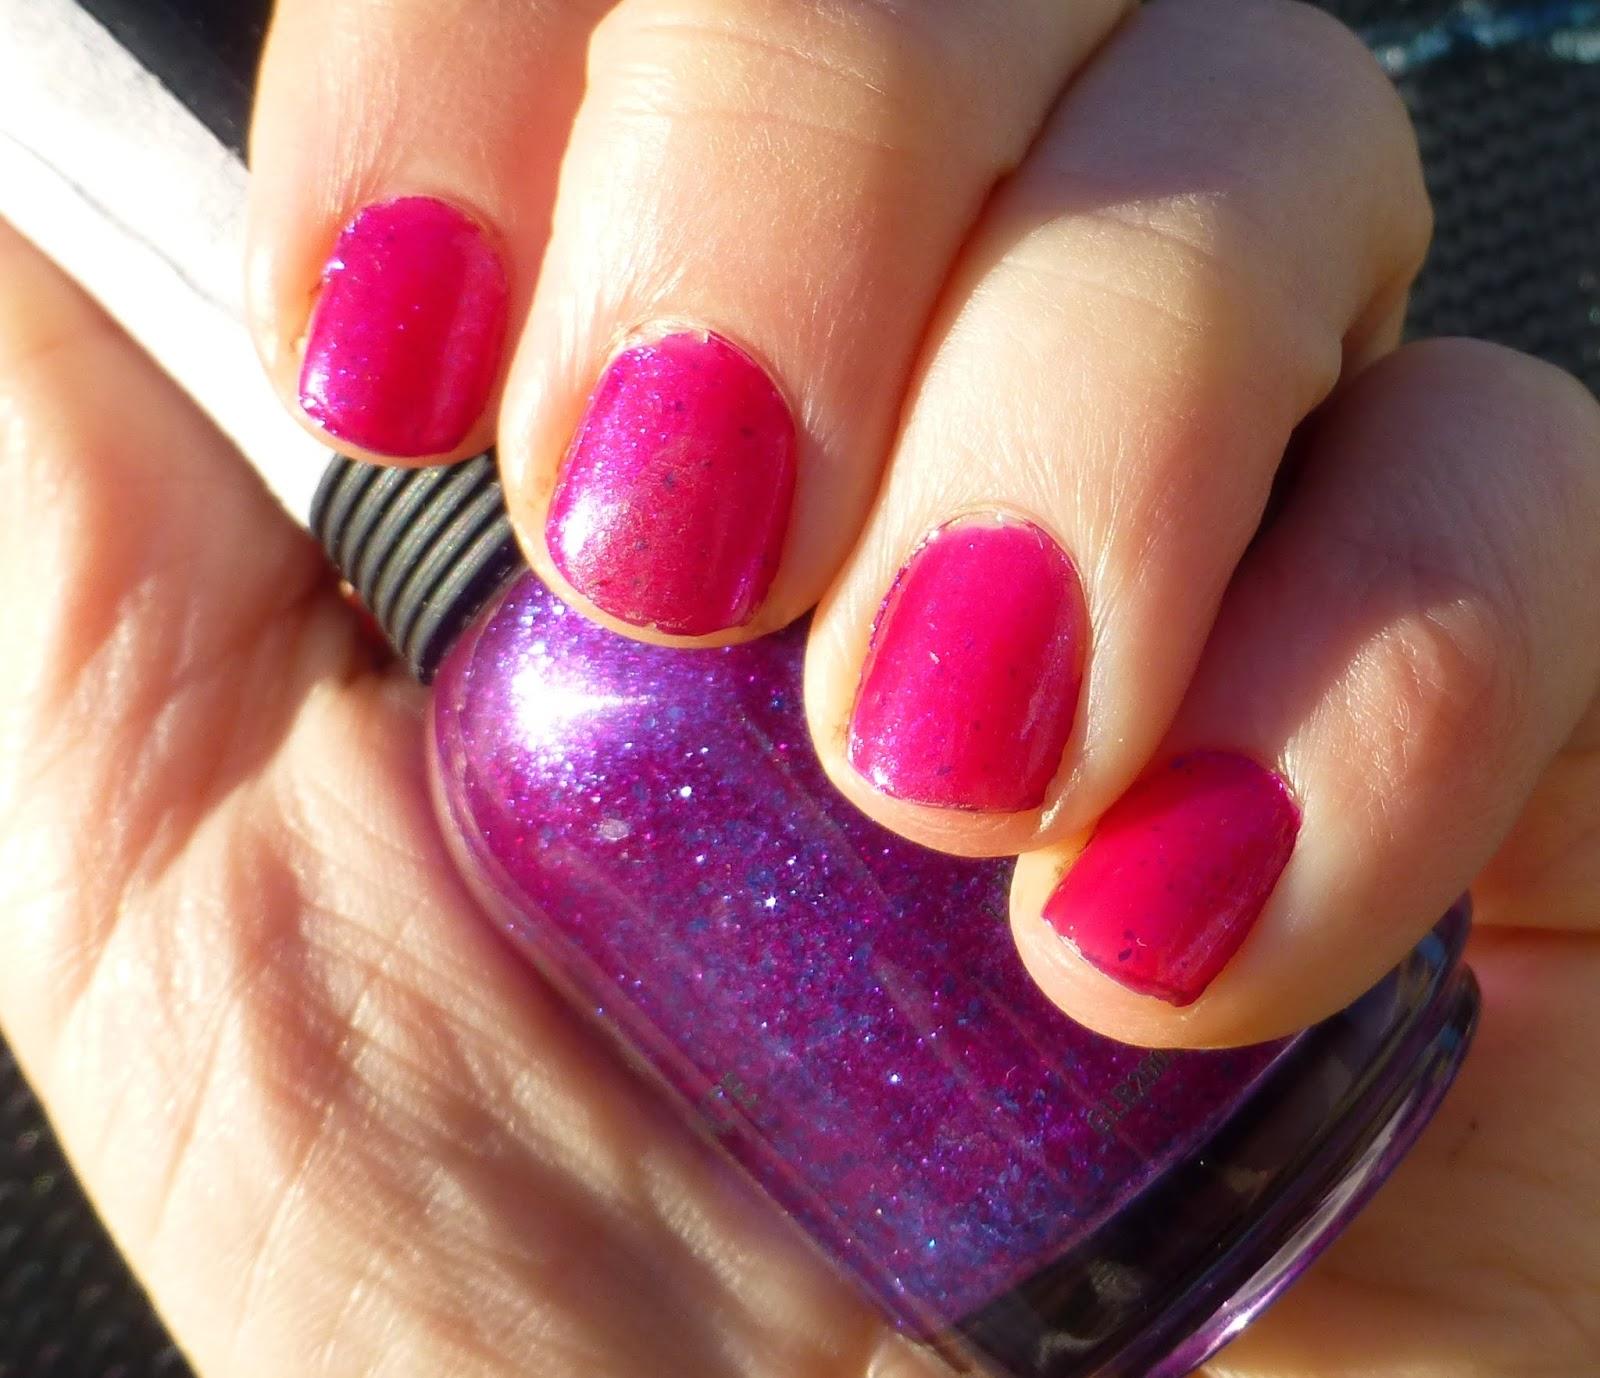 Orly Purple Poodle nail polish